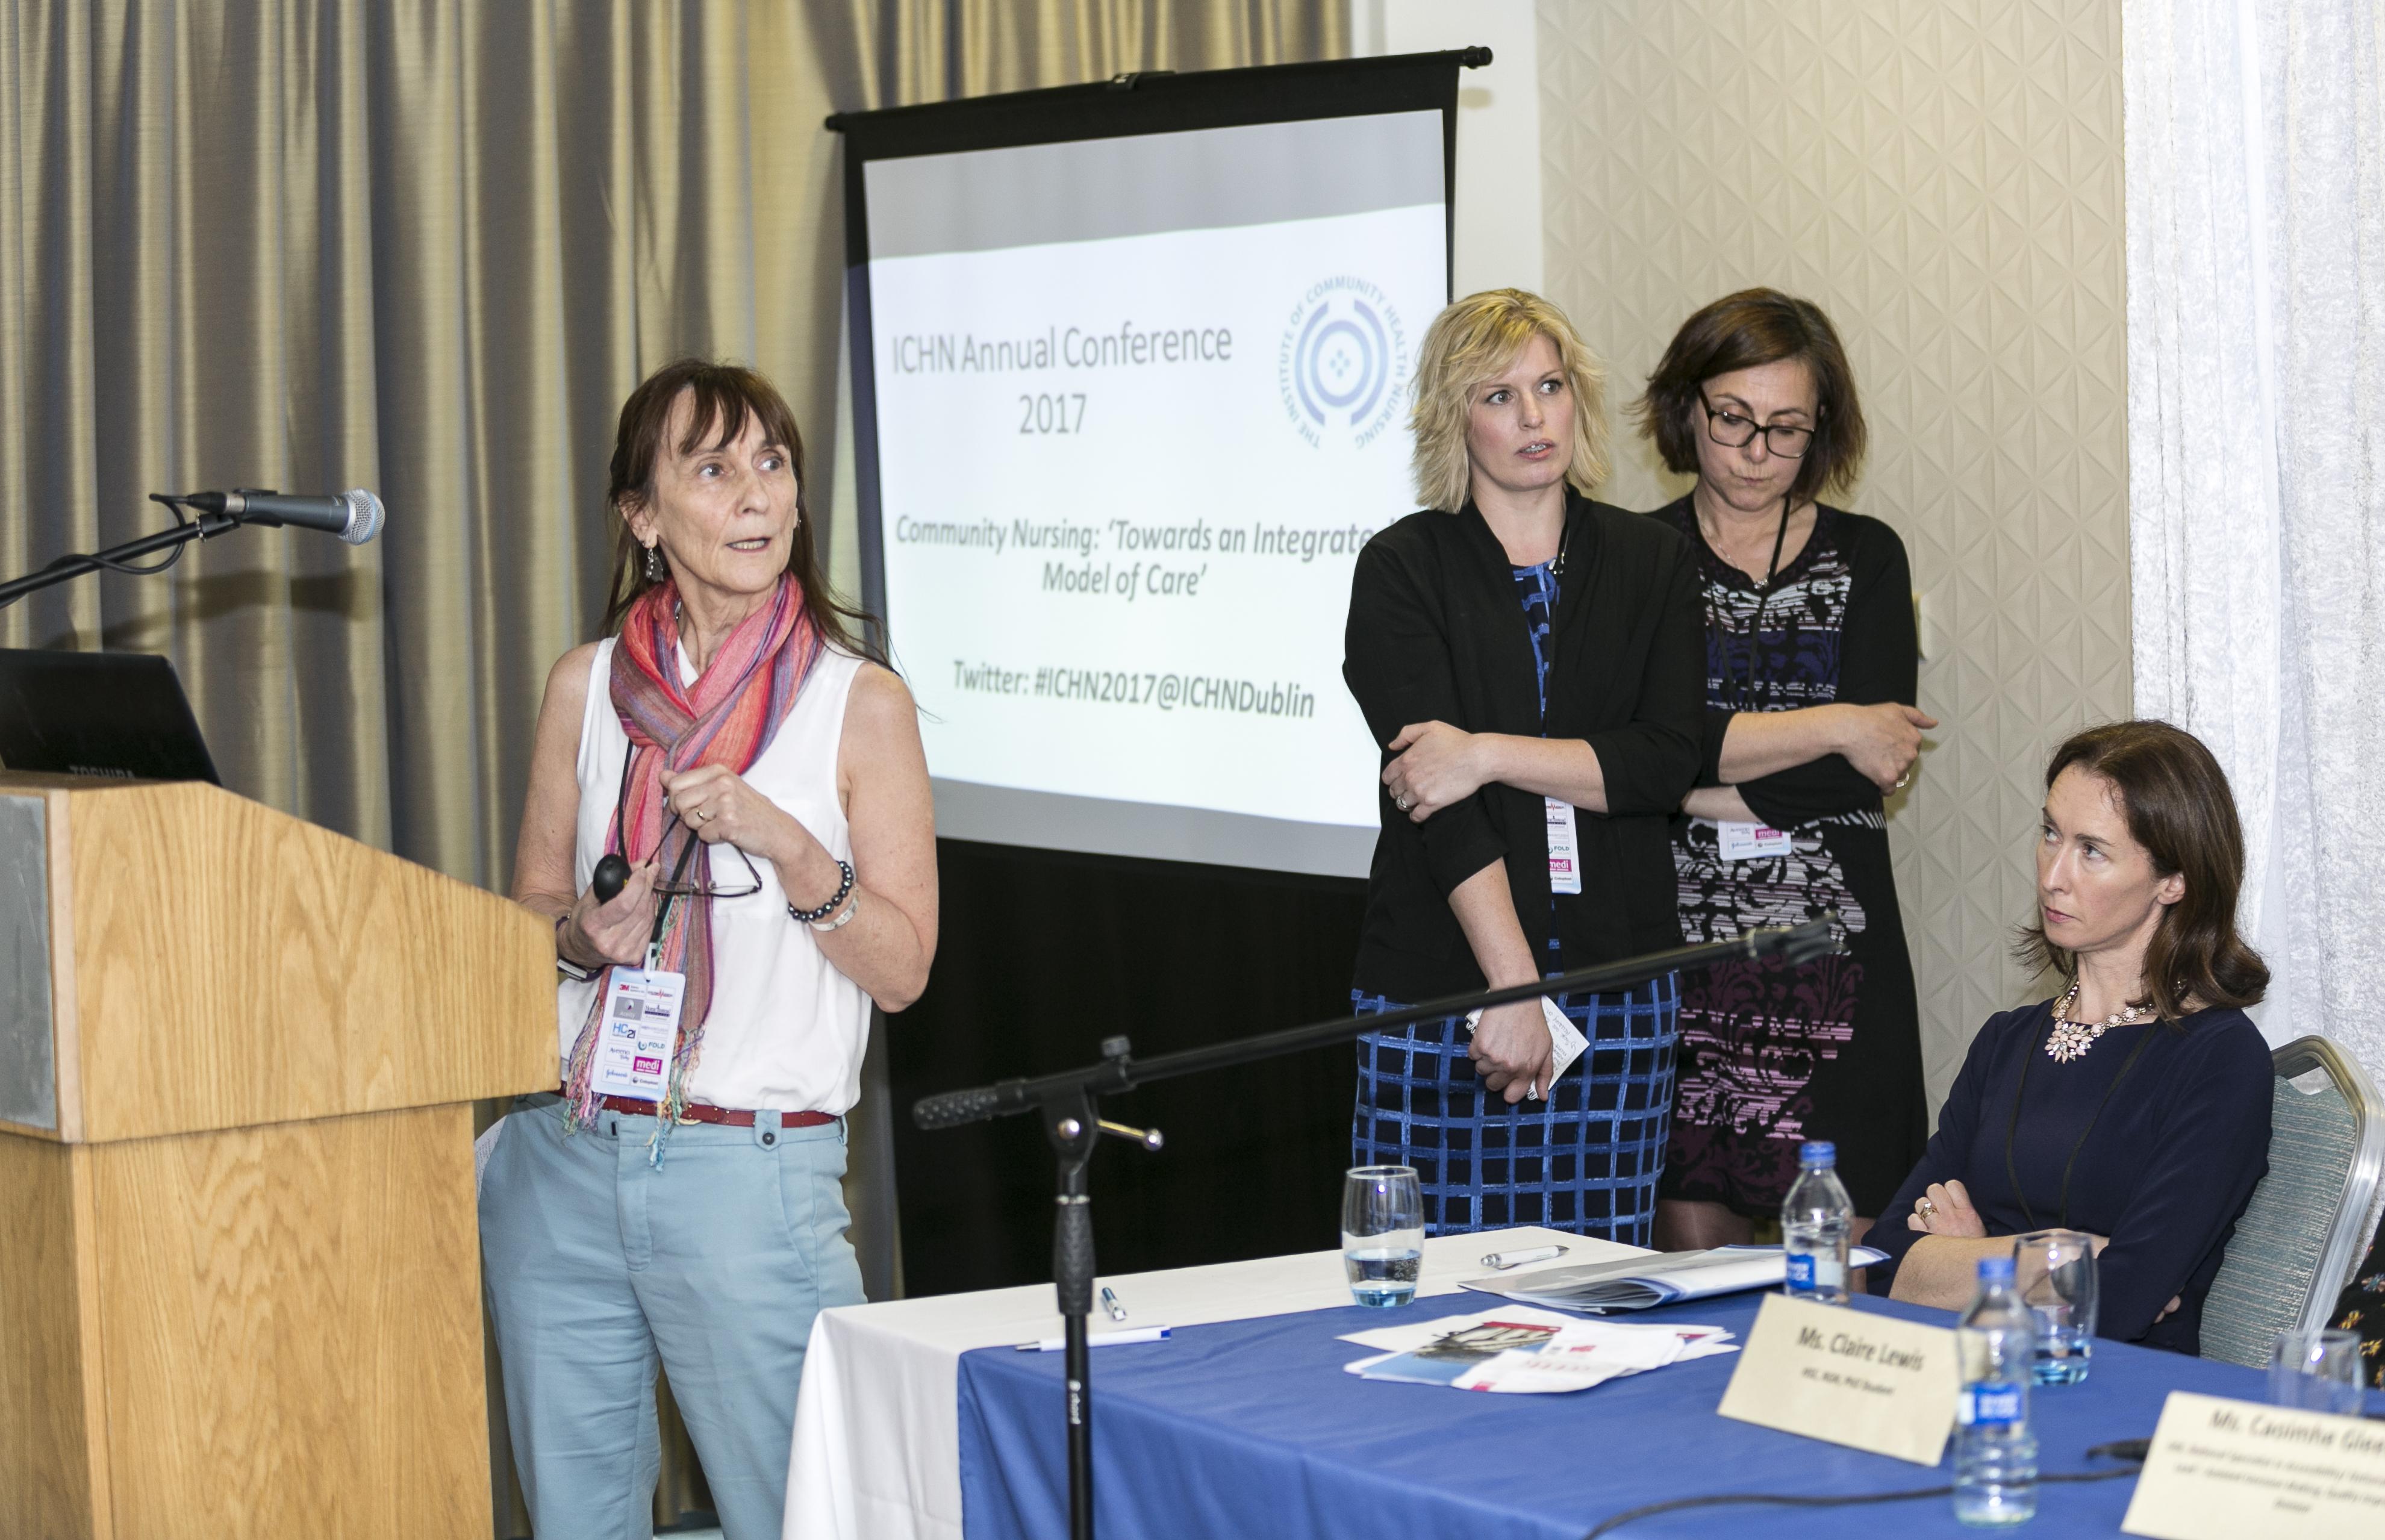 Institute of Community Health Nursing, Conference 2017, held in The Hilton Hotel, Kilmainham, Dublin. May 2017.Photographer - Paul Sherwood paul@sherwood.ie 087 230 9096